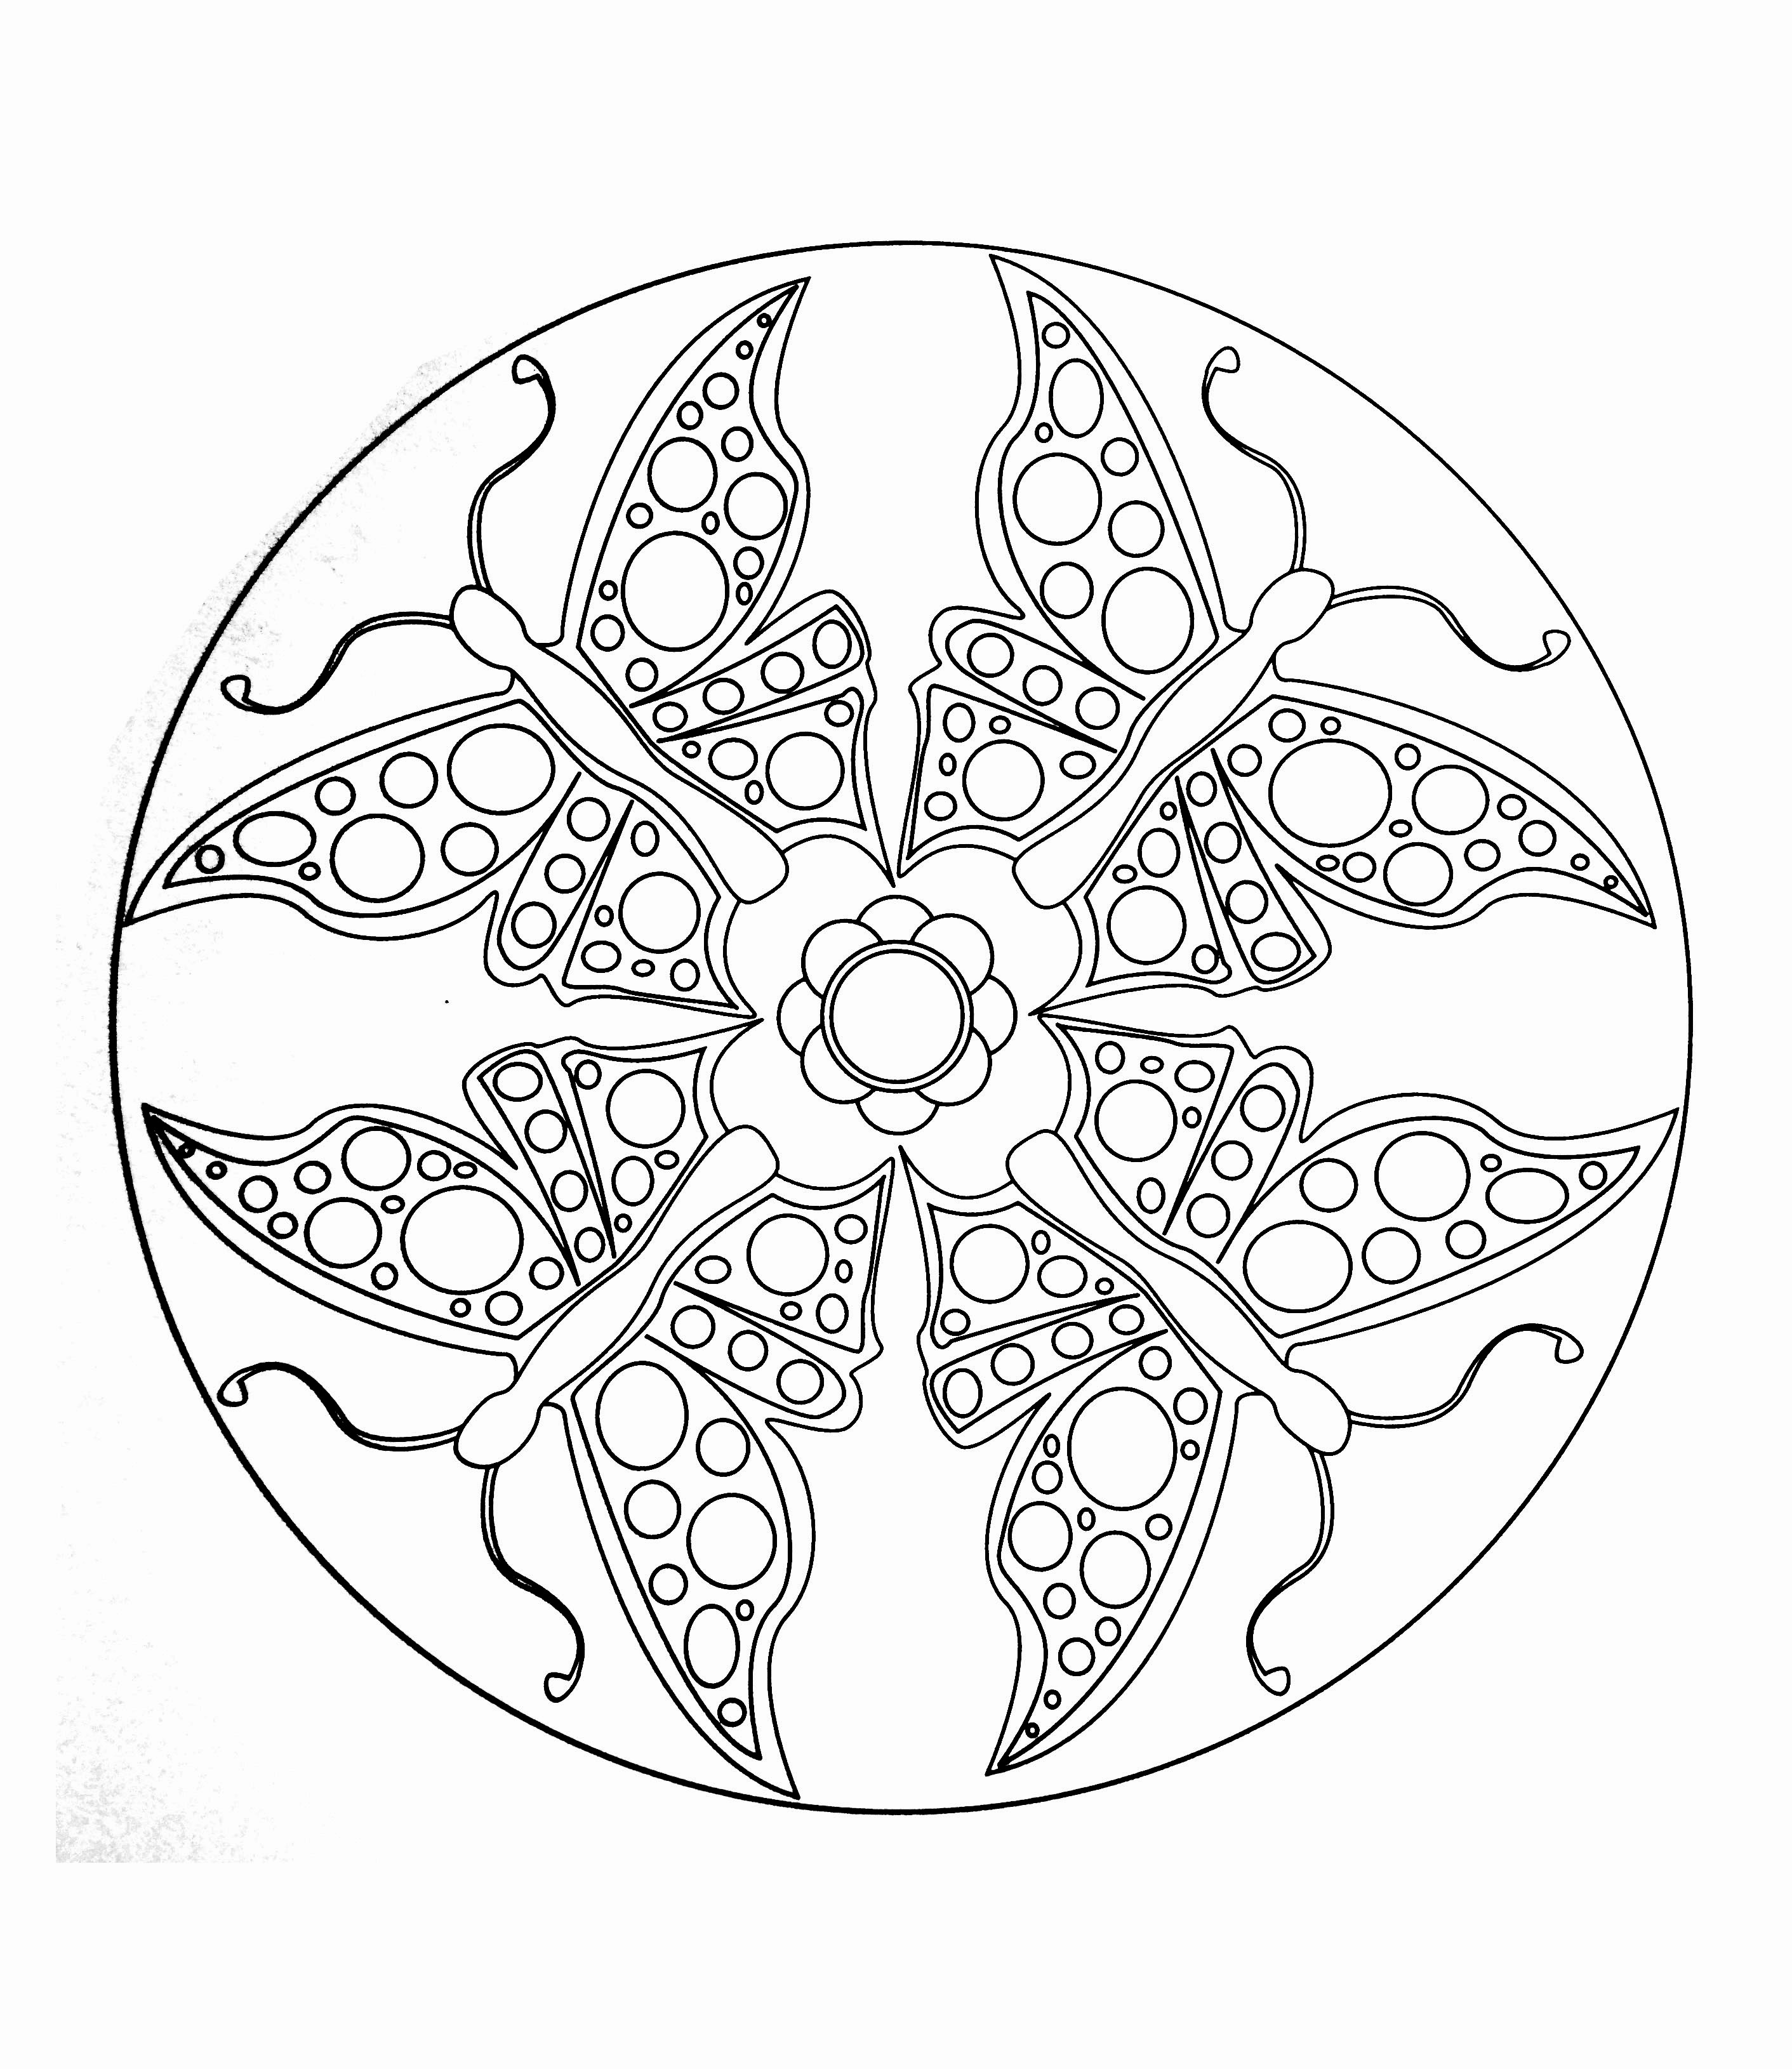 15 Coloriage Mandala Facile Gratuit | Imprimer et Obtenir une Coloriage Gratuit Ici